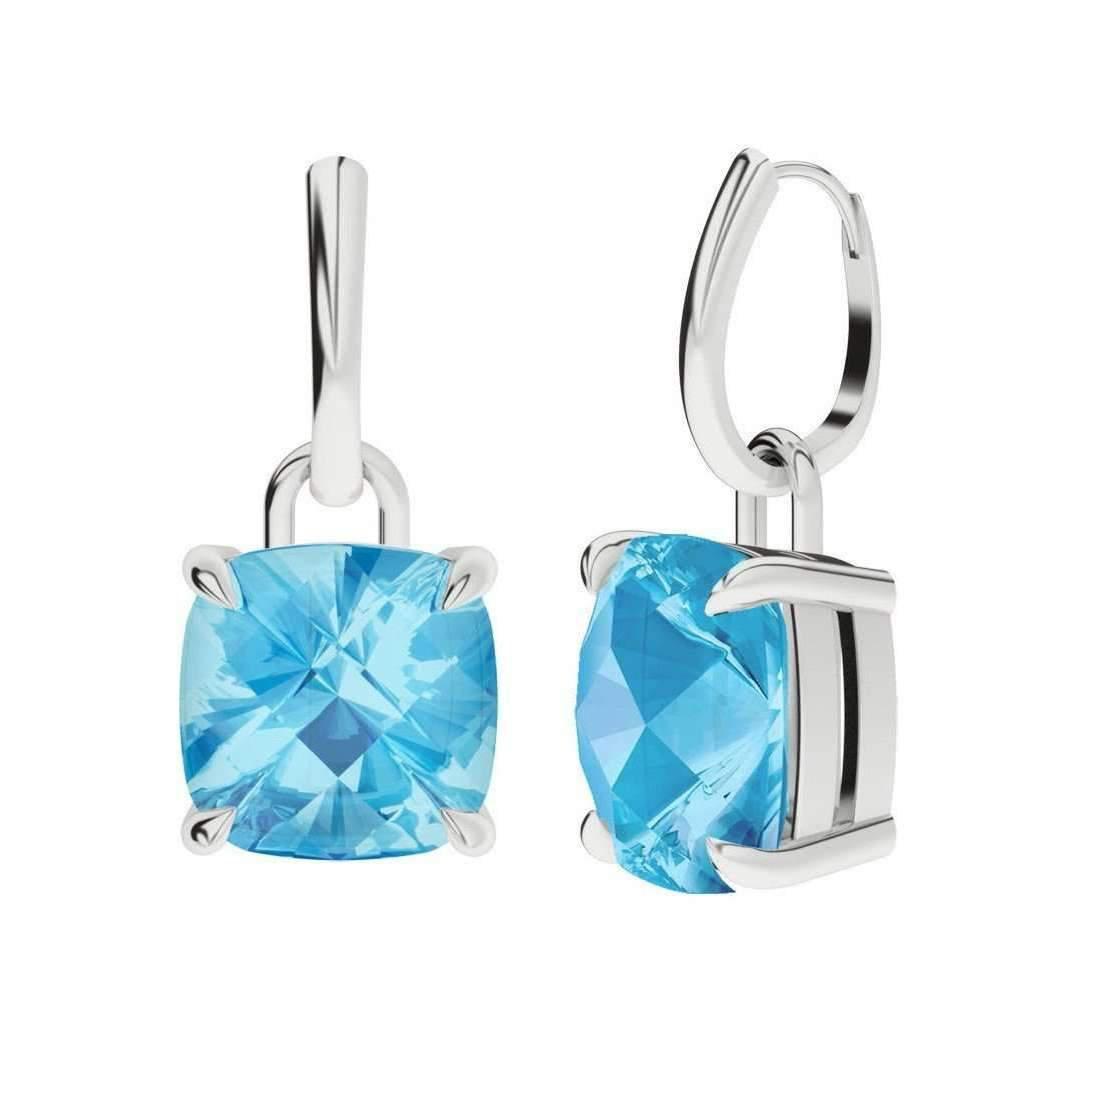 StyleRocks Rose Quartz 9kt White Gold And Diamond Drop Earrings VX941b